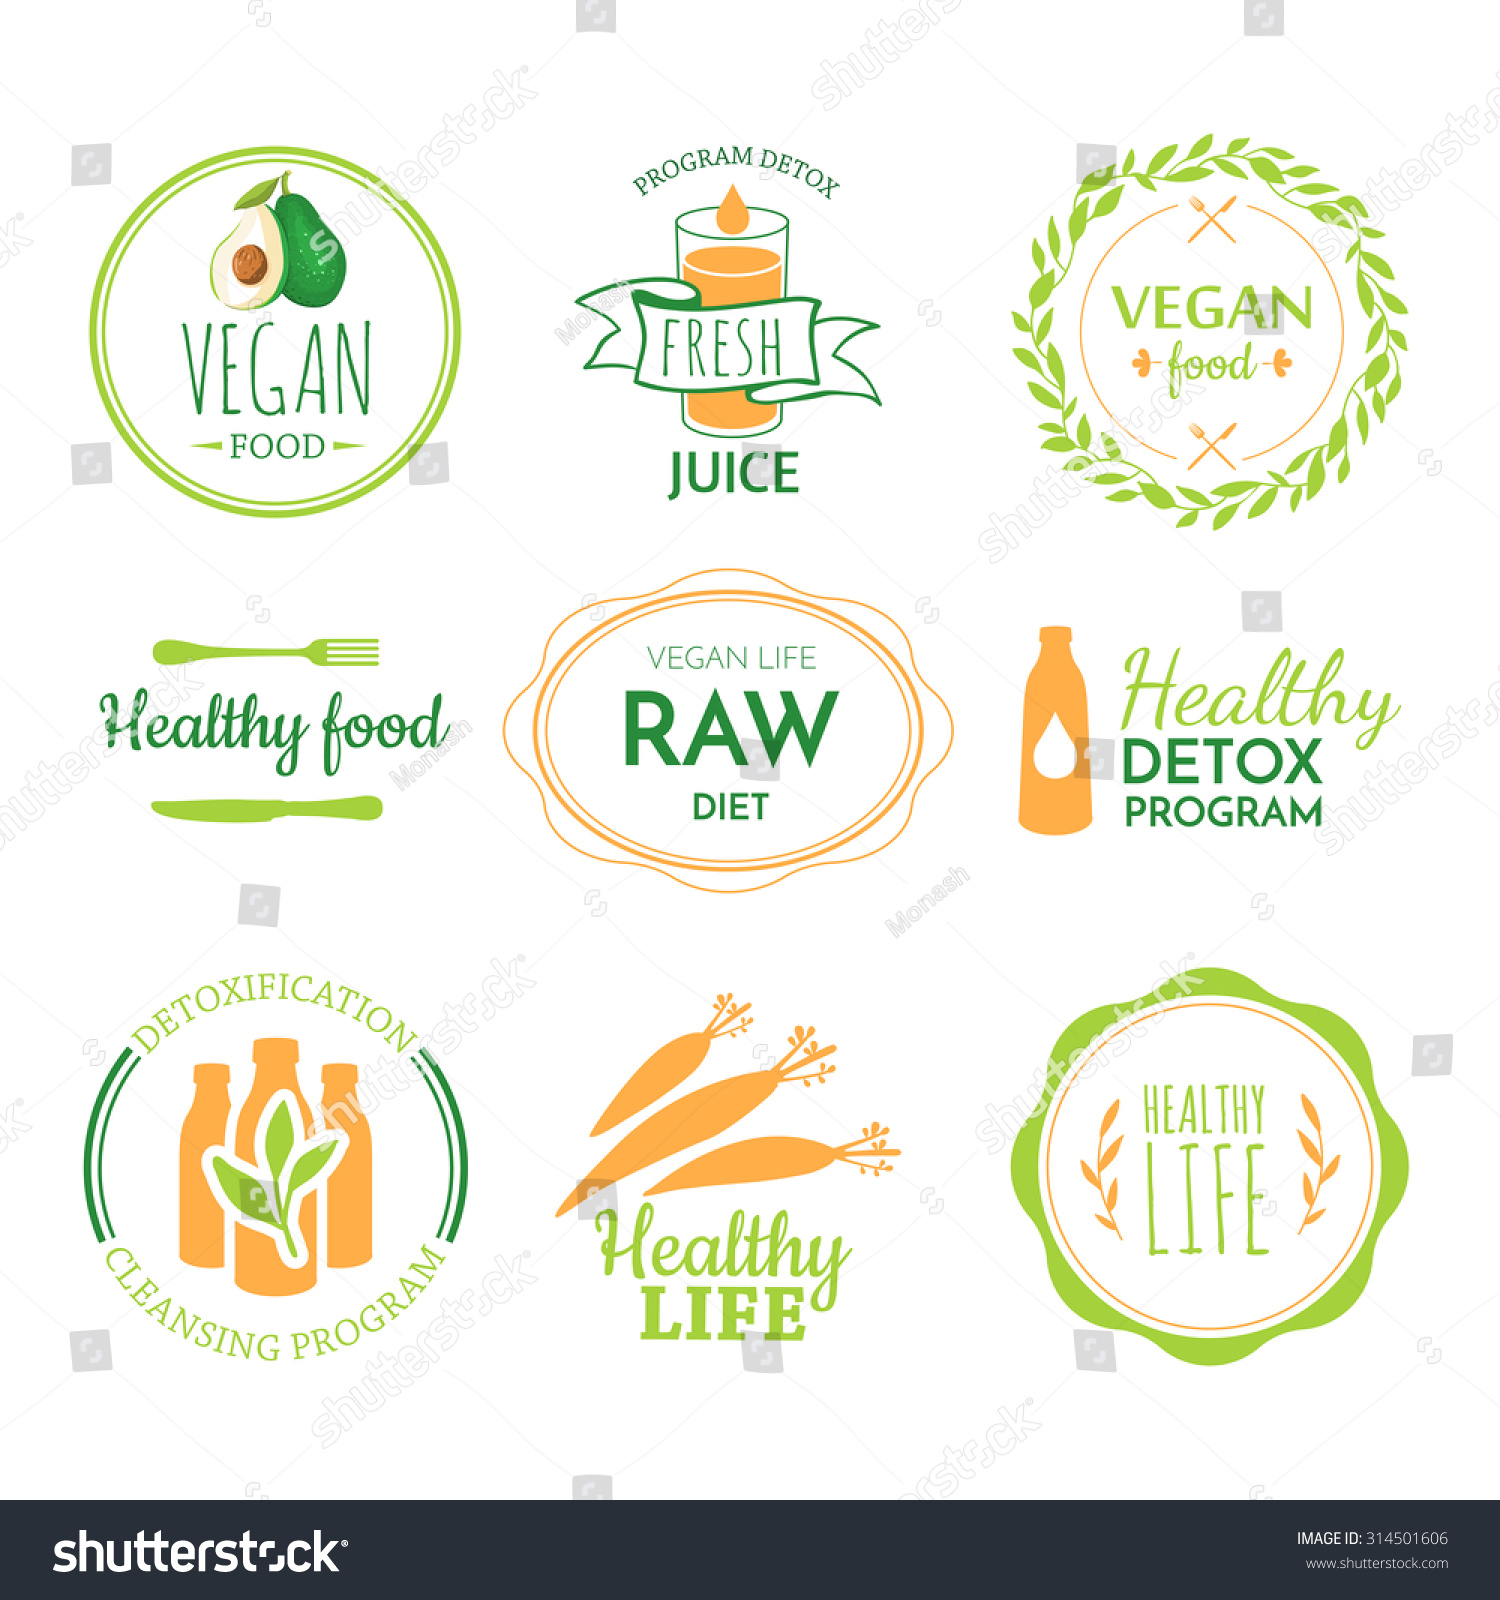 Detox Logo Vegetarian Useful Meal Raw Stock Vector ...